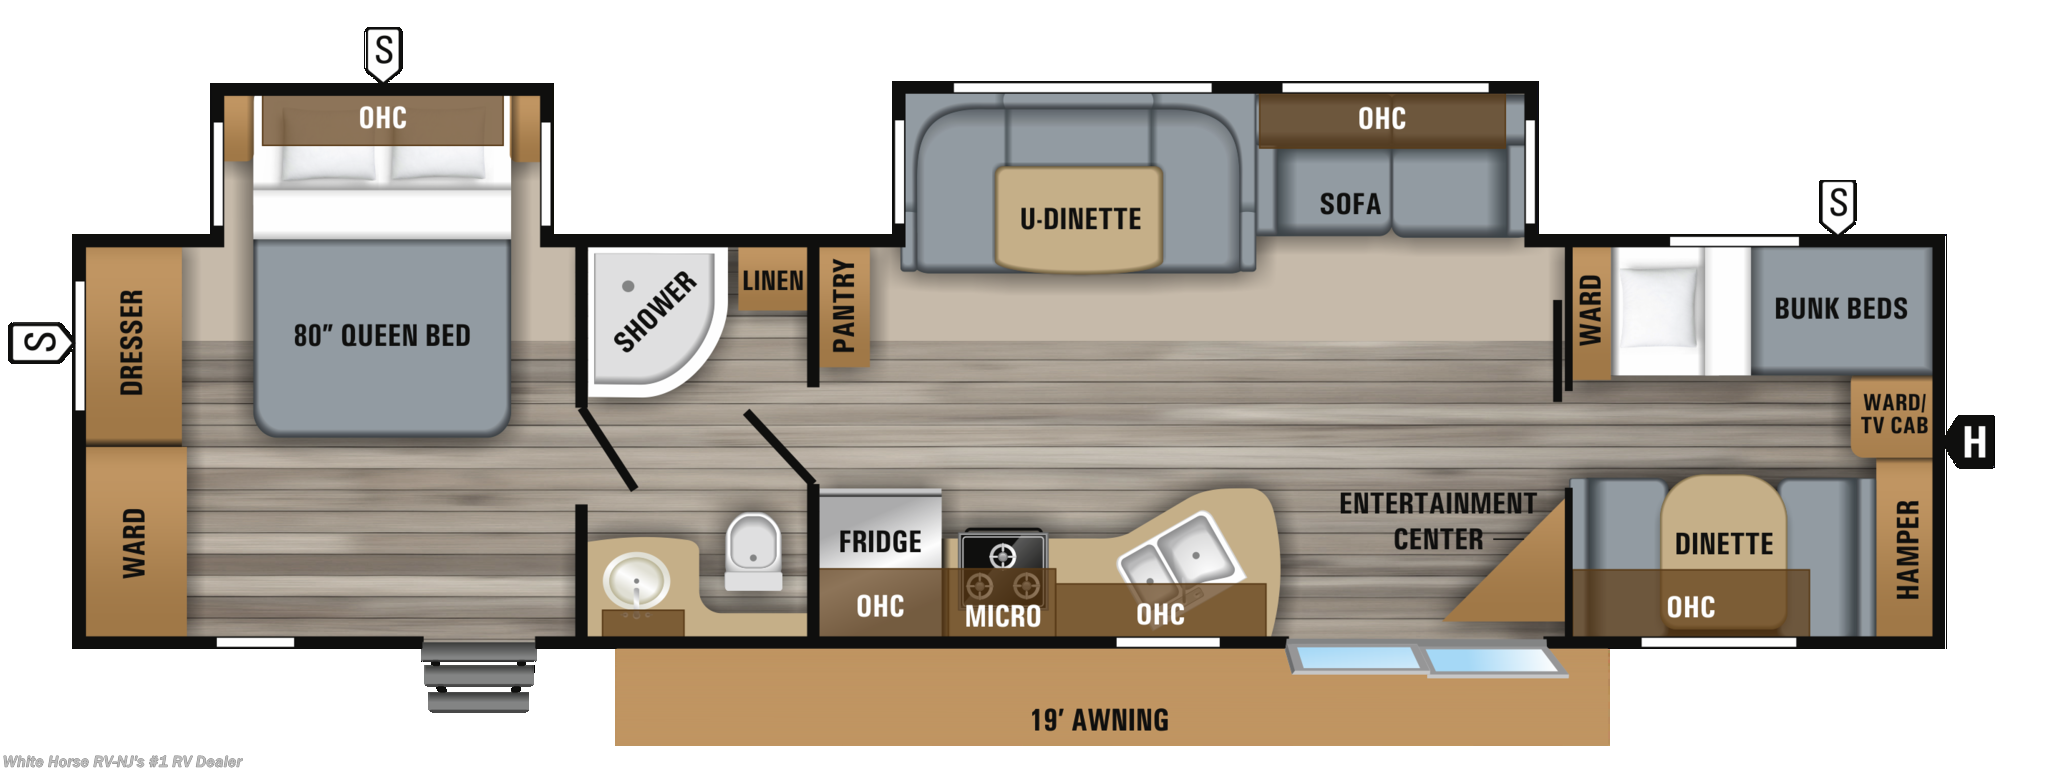 2019 Jayco RV Jay Flight 38BHDS 2-Bedroom Double Slideout ... on rv wiring kits, rv power supply schematics, rv generator wiring diagram, rv wiring parts, breaker box schematics, rv inverter wiring diagram, onan rv generator schematics, rv plumbing schematics, rv trailer wiring, rv wiring system, rv wiring code, rv construction schematics, rv ac wiring diagram, norcold ac dc refrigerator schematics, rv converter schematic, rv wiring layout, rv electrical schematics, rv electrical wiring, rv power system schematic, rv wiring diagrams online,